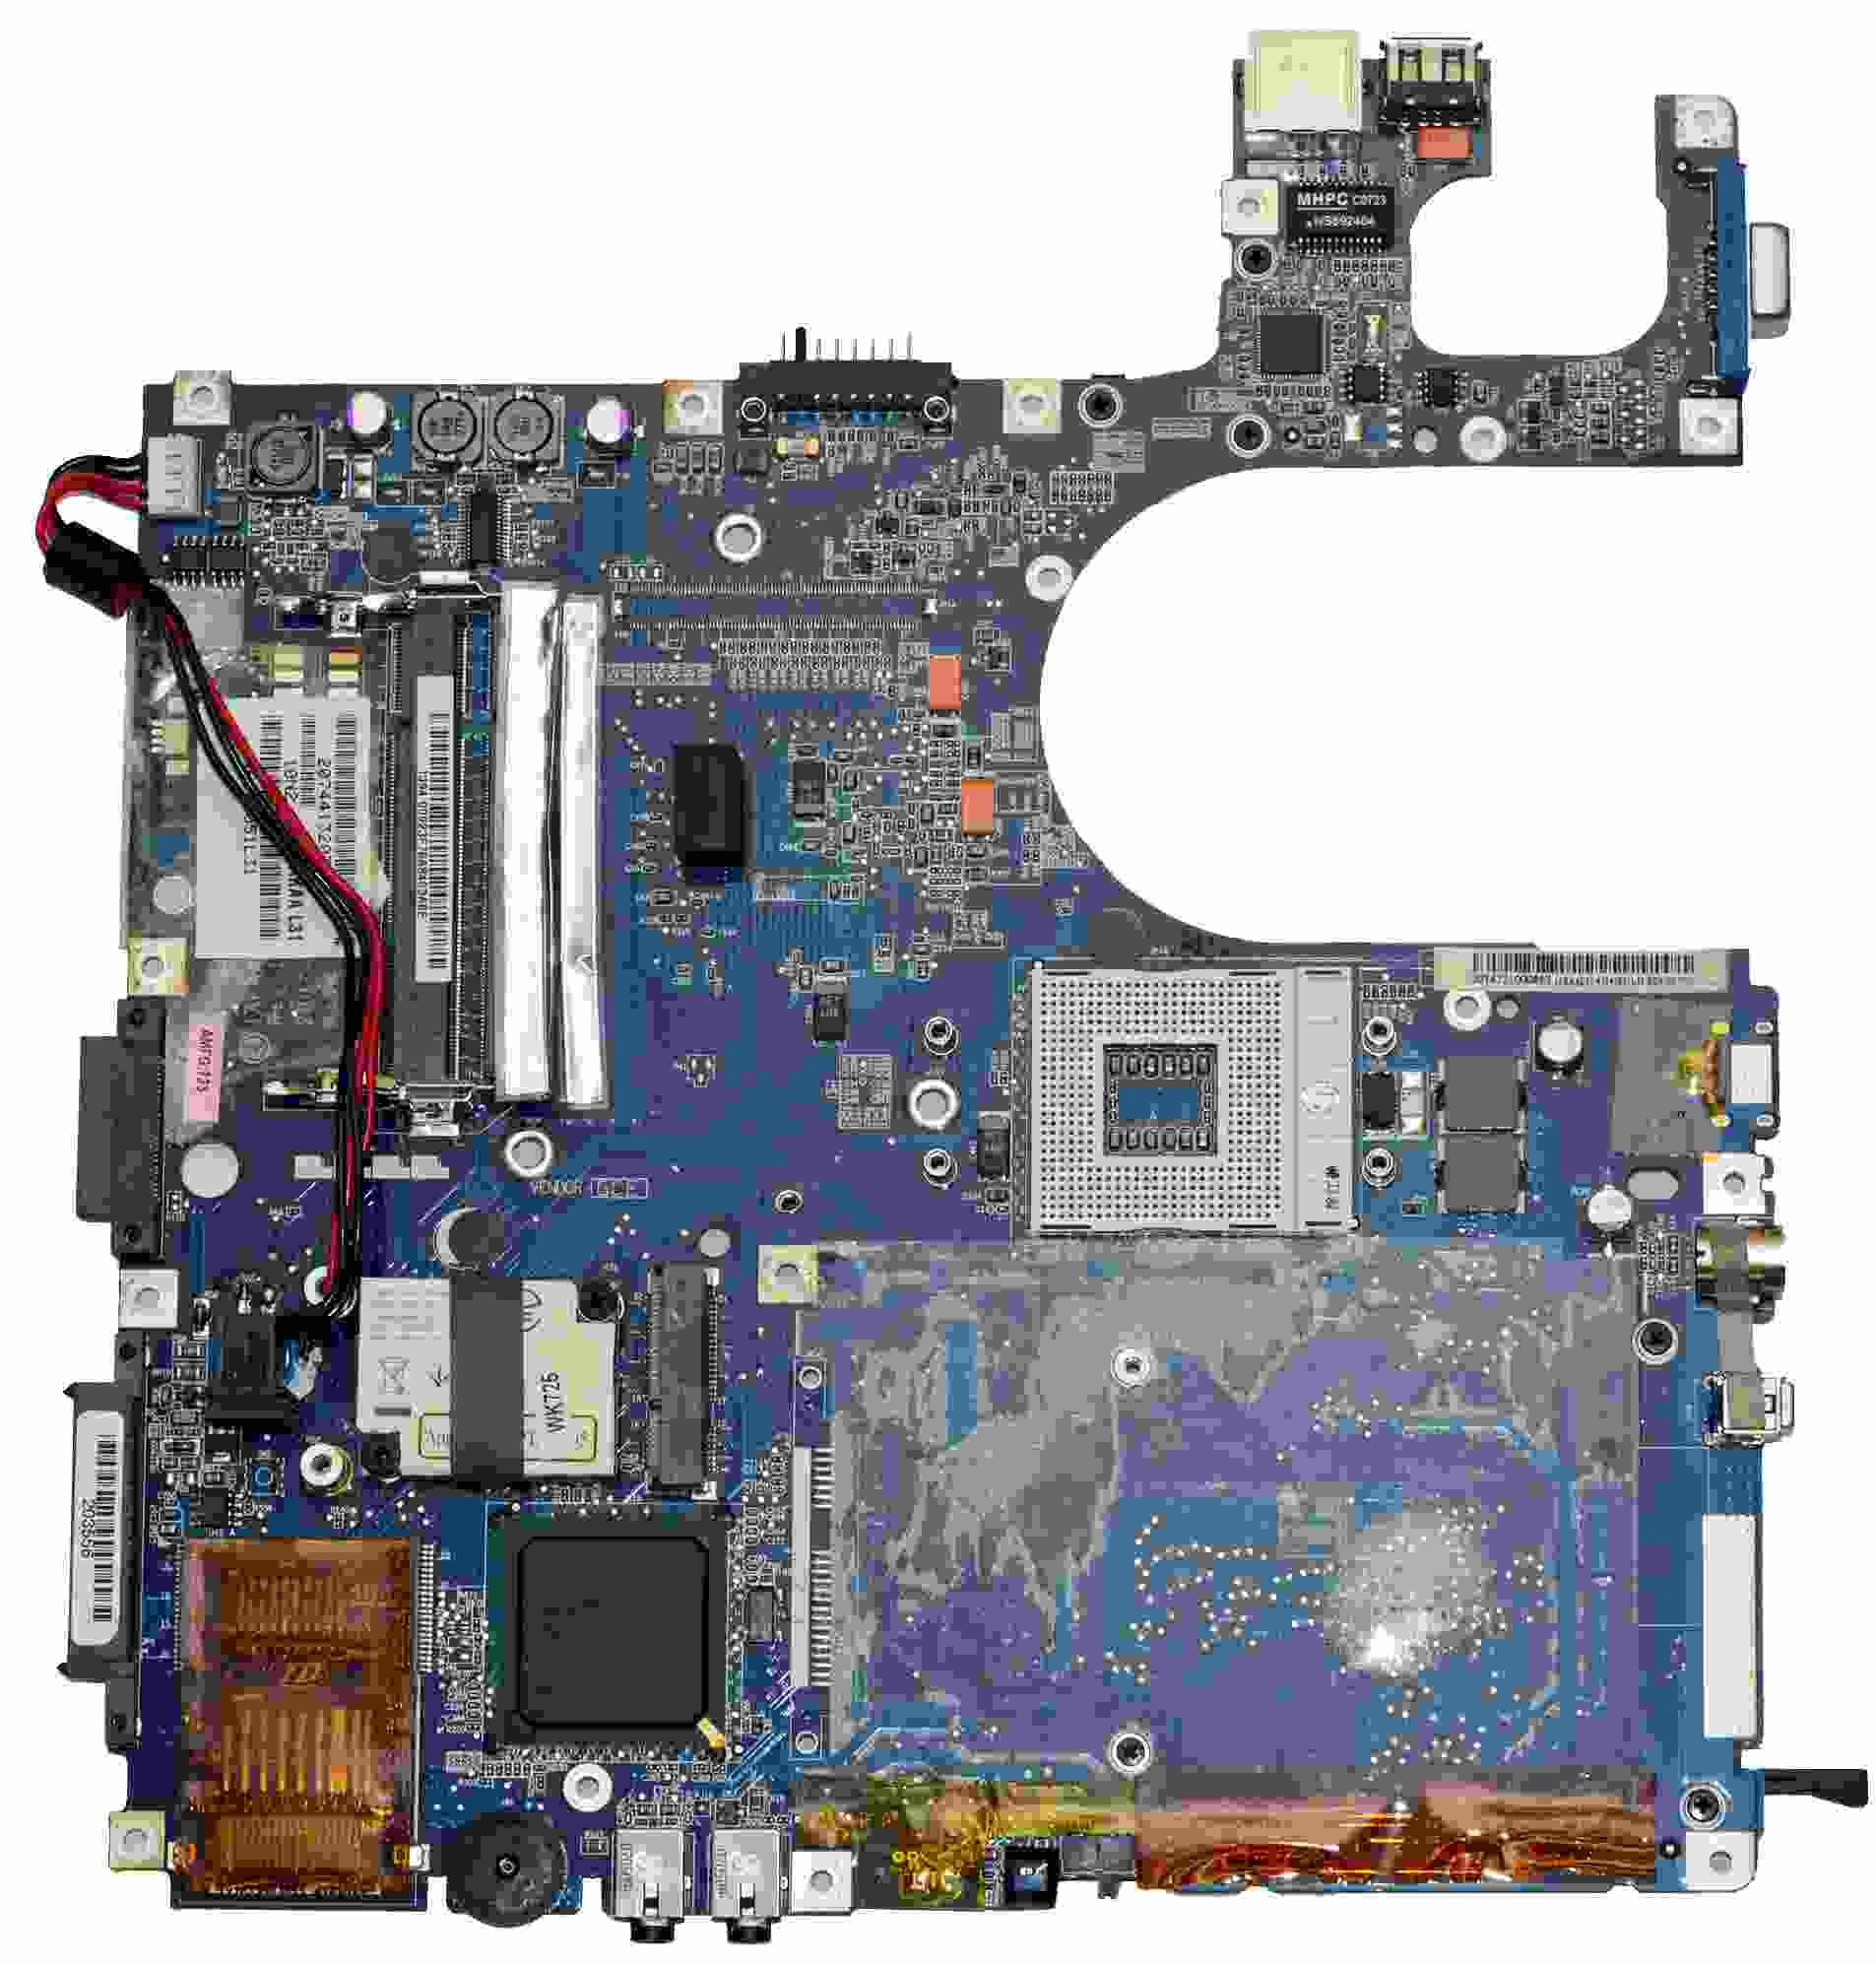 K000045820 TOSHIBA SATELLITE A135 LAPTOP SB + Toshiba en Veo y Compro